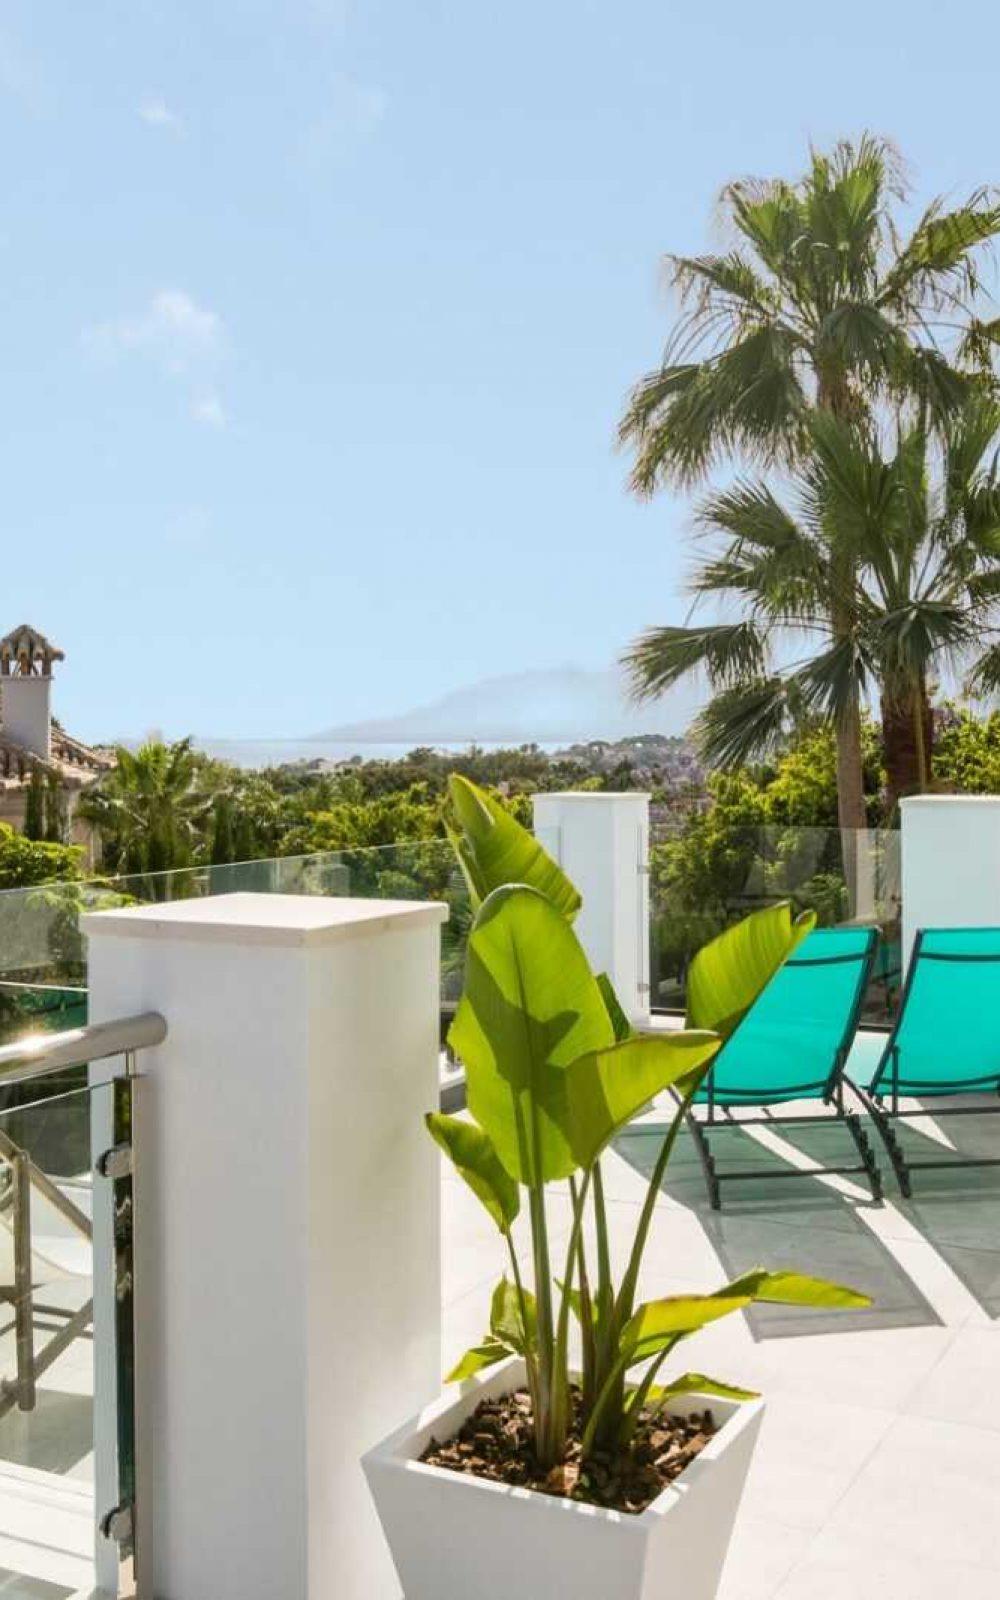 2017.06.01 - Just Rent Marbella - Villa Marlin - (4 of 6) (Large)